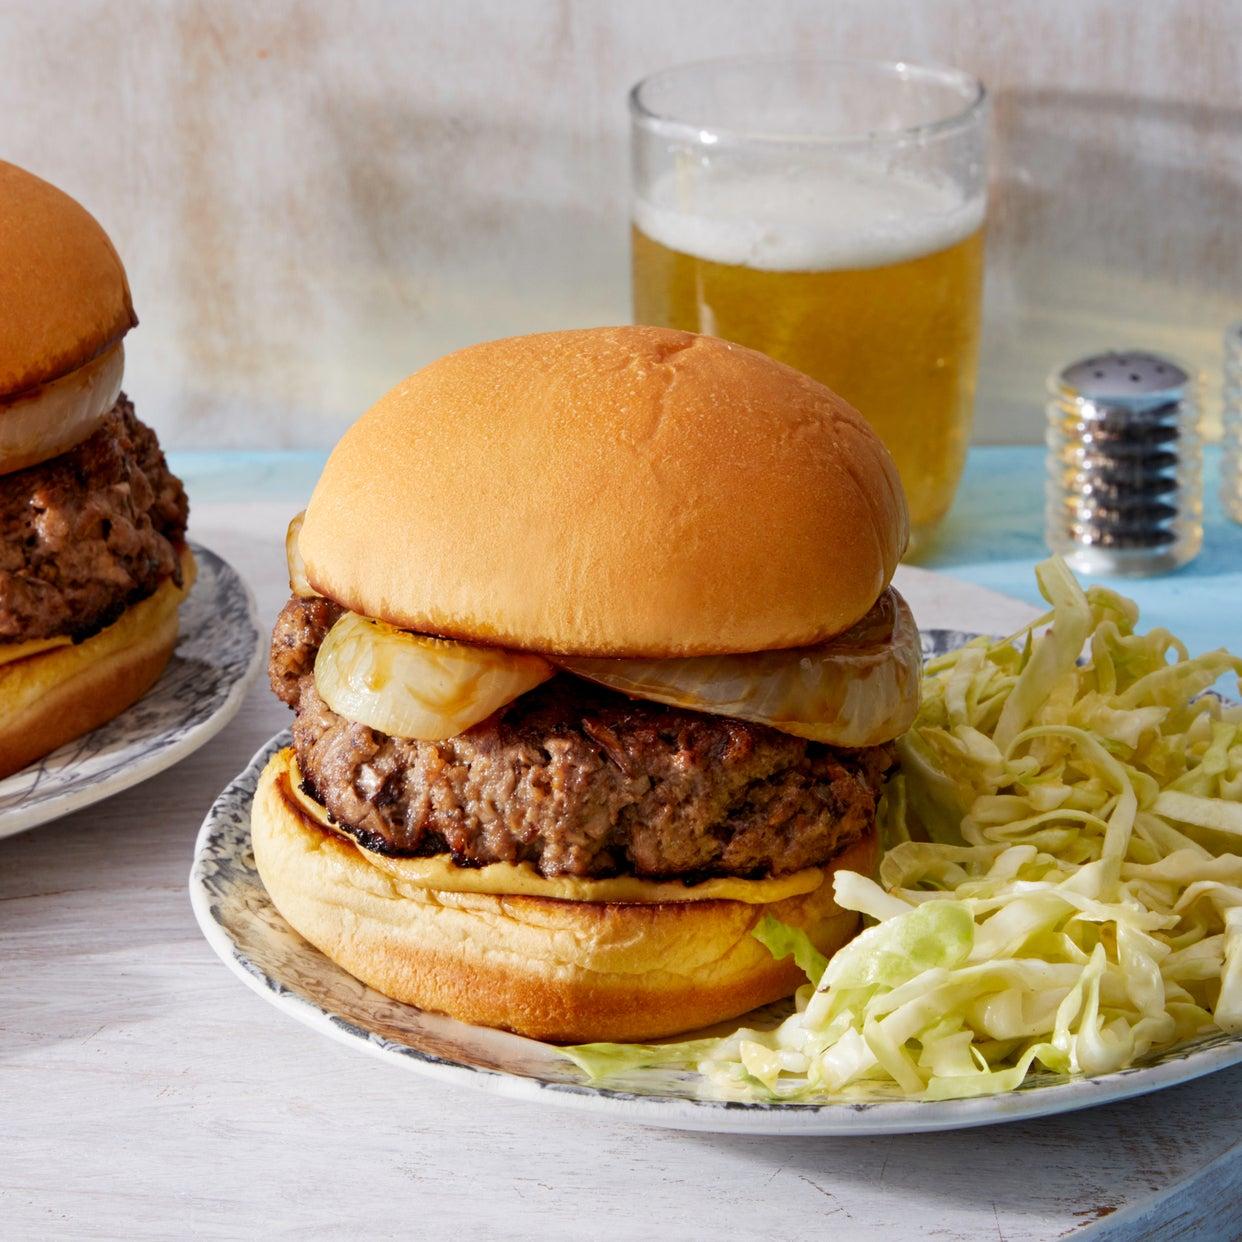 Beef & Mushroom Burgers with Roasted Onion & Marinated Cabbage